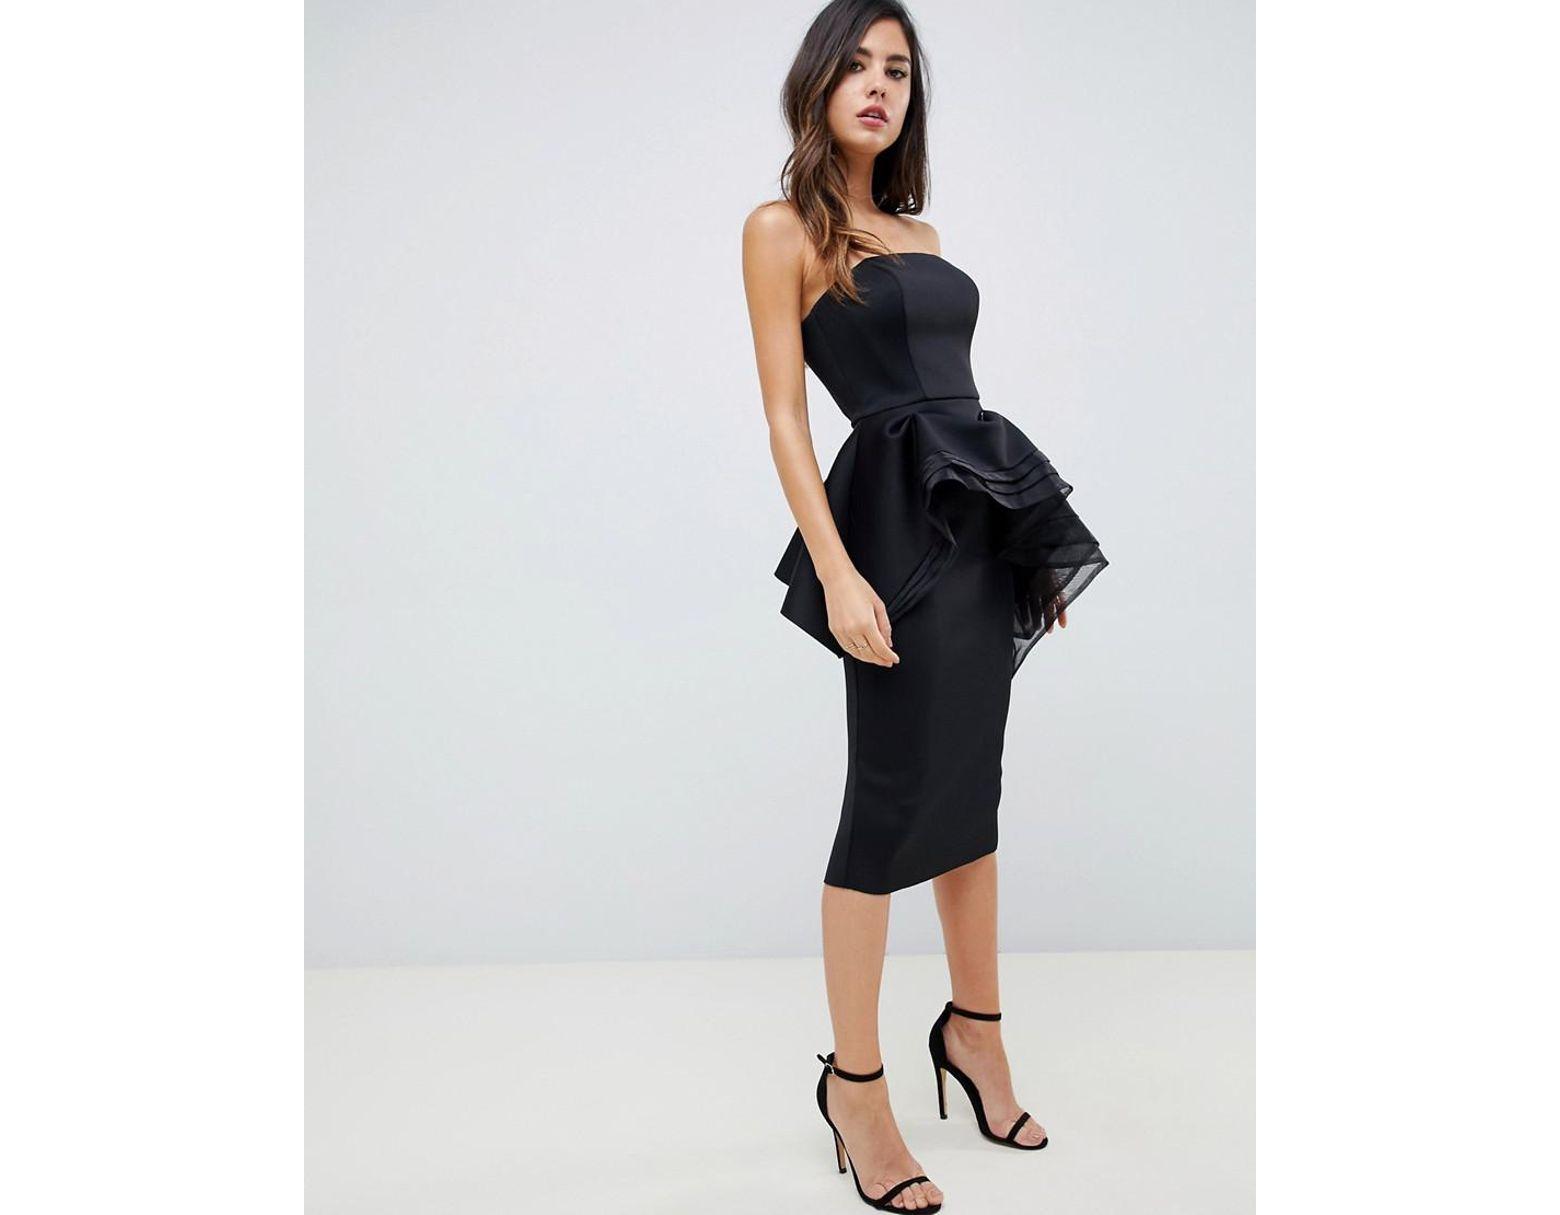 eb09e695f6d Women's Black Premium Bandeau Peplum Bodycon Midi Dress With Organza